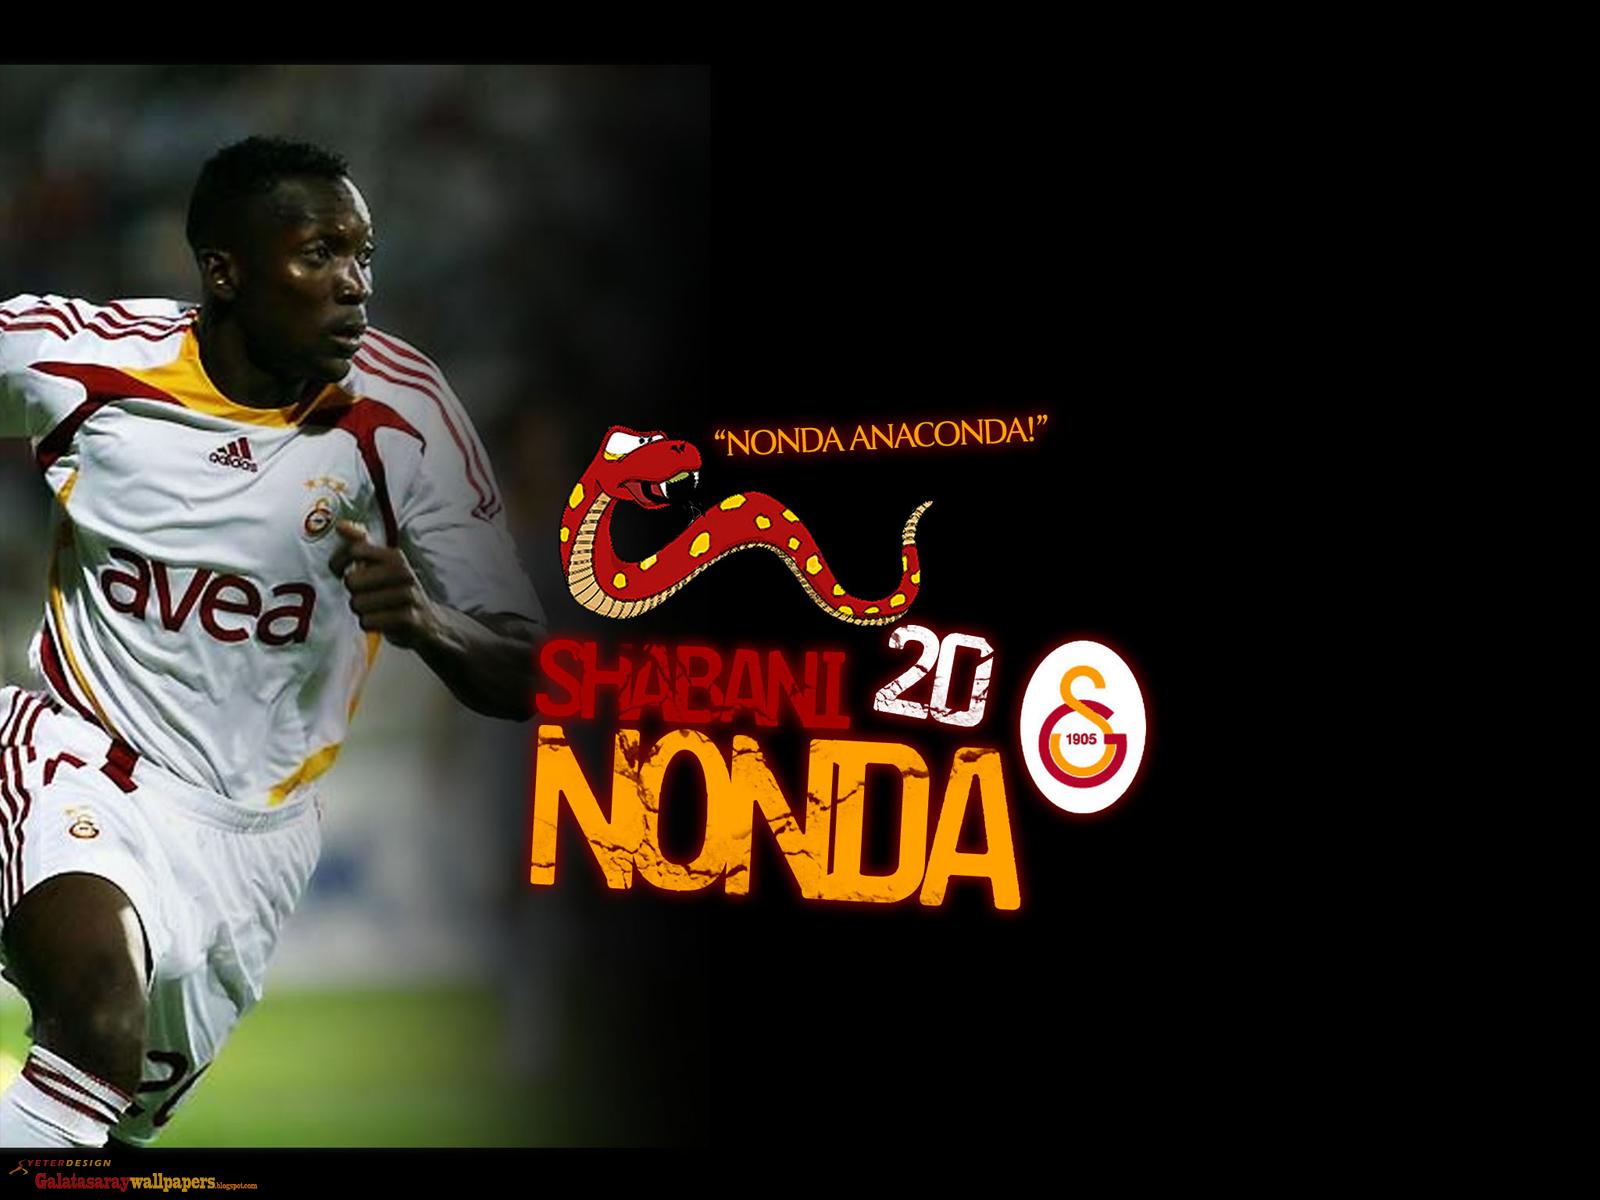 Galatasaray Wallpapers: Shabani Nonda